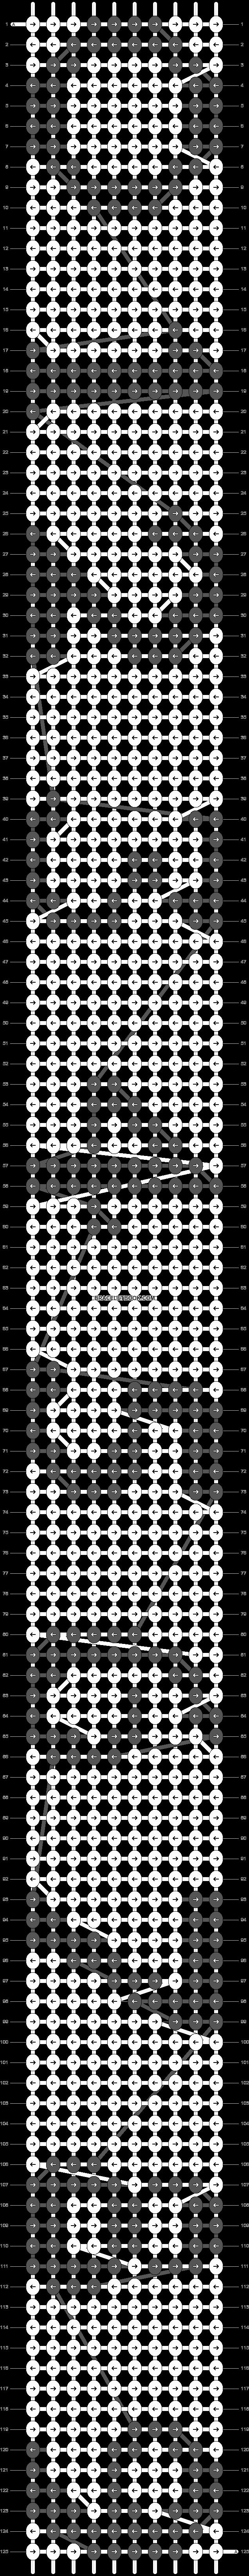 Alpha pattern #16561 pattern